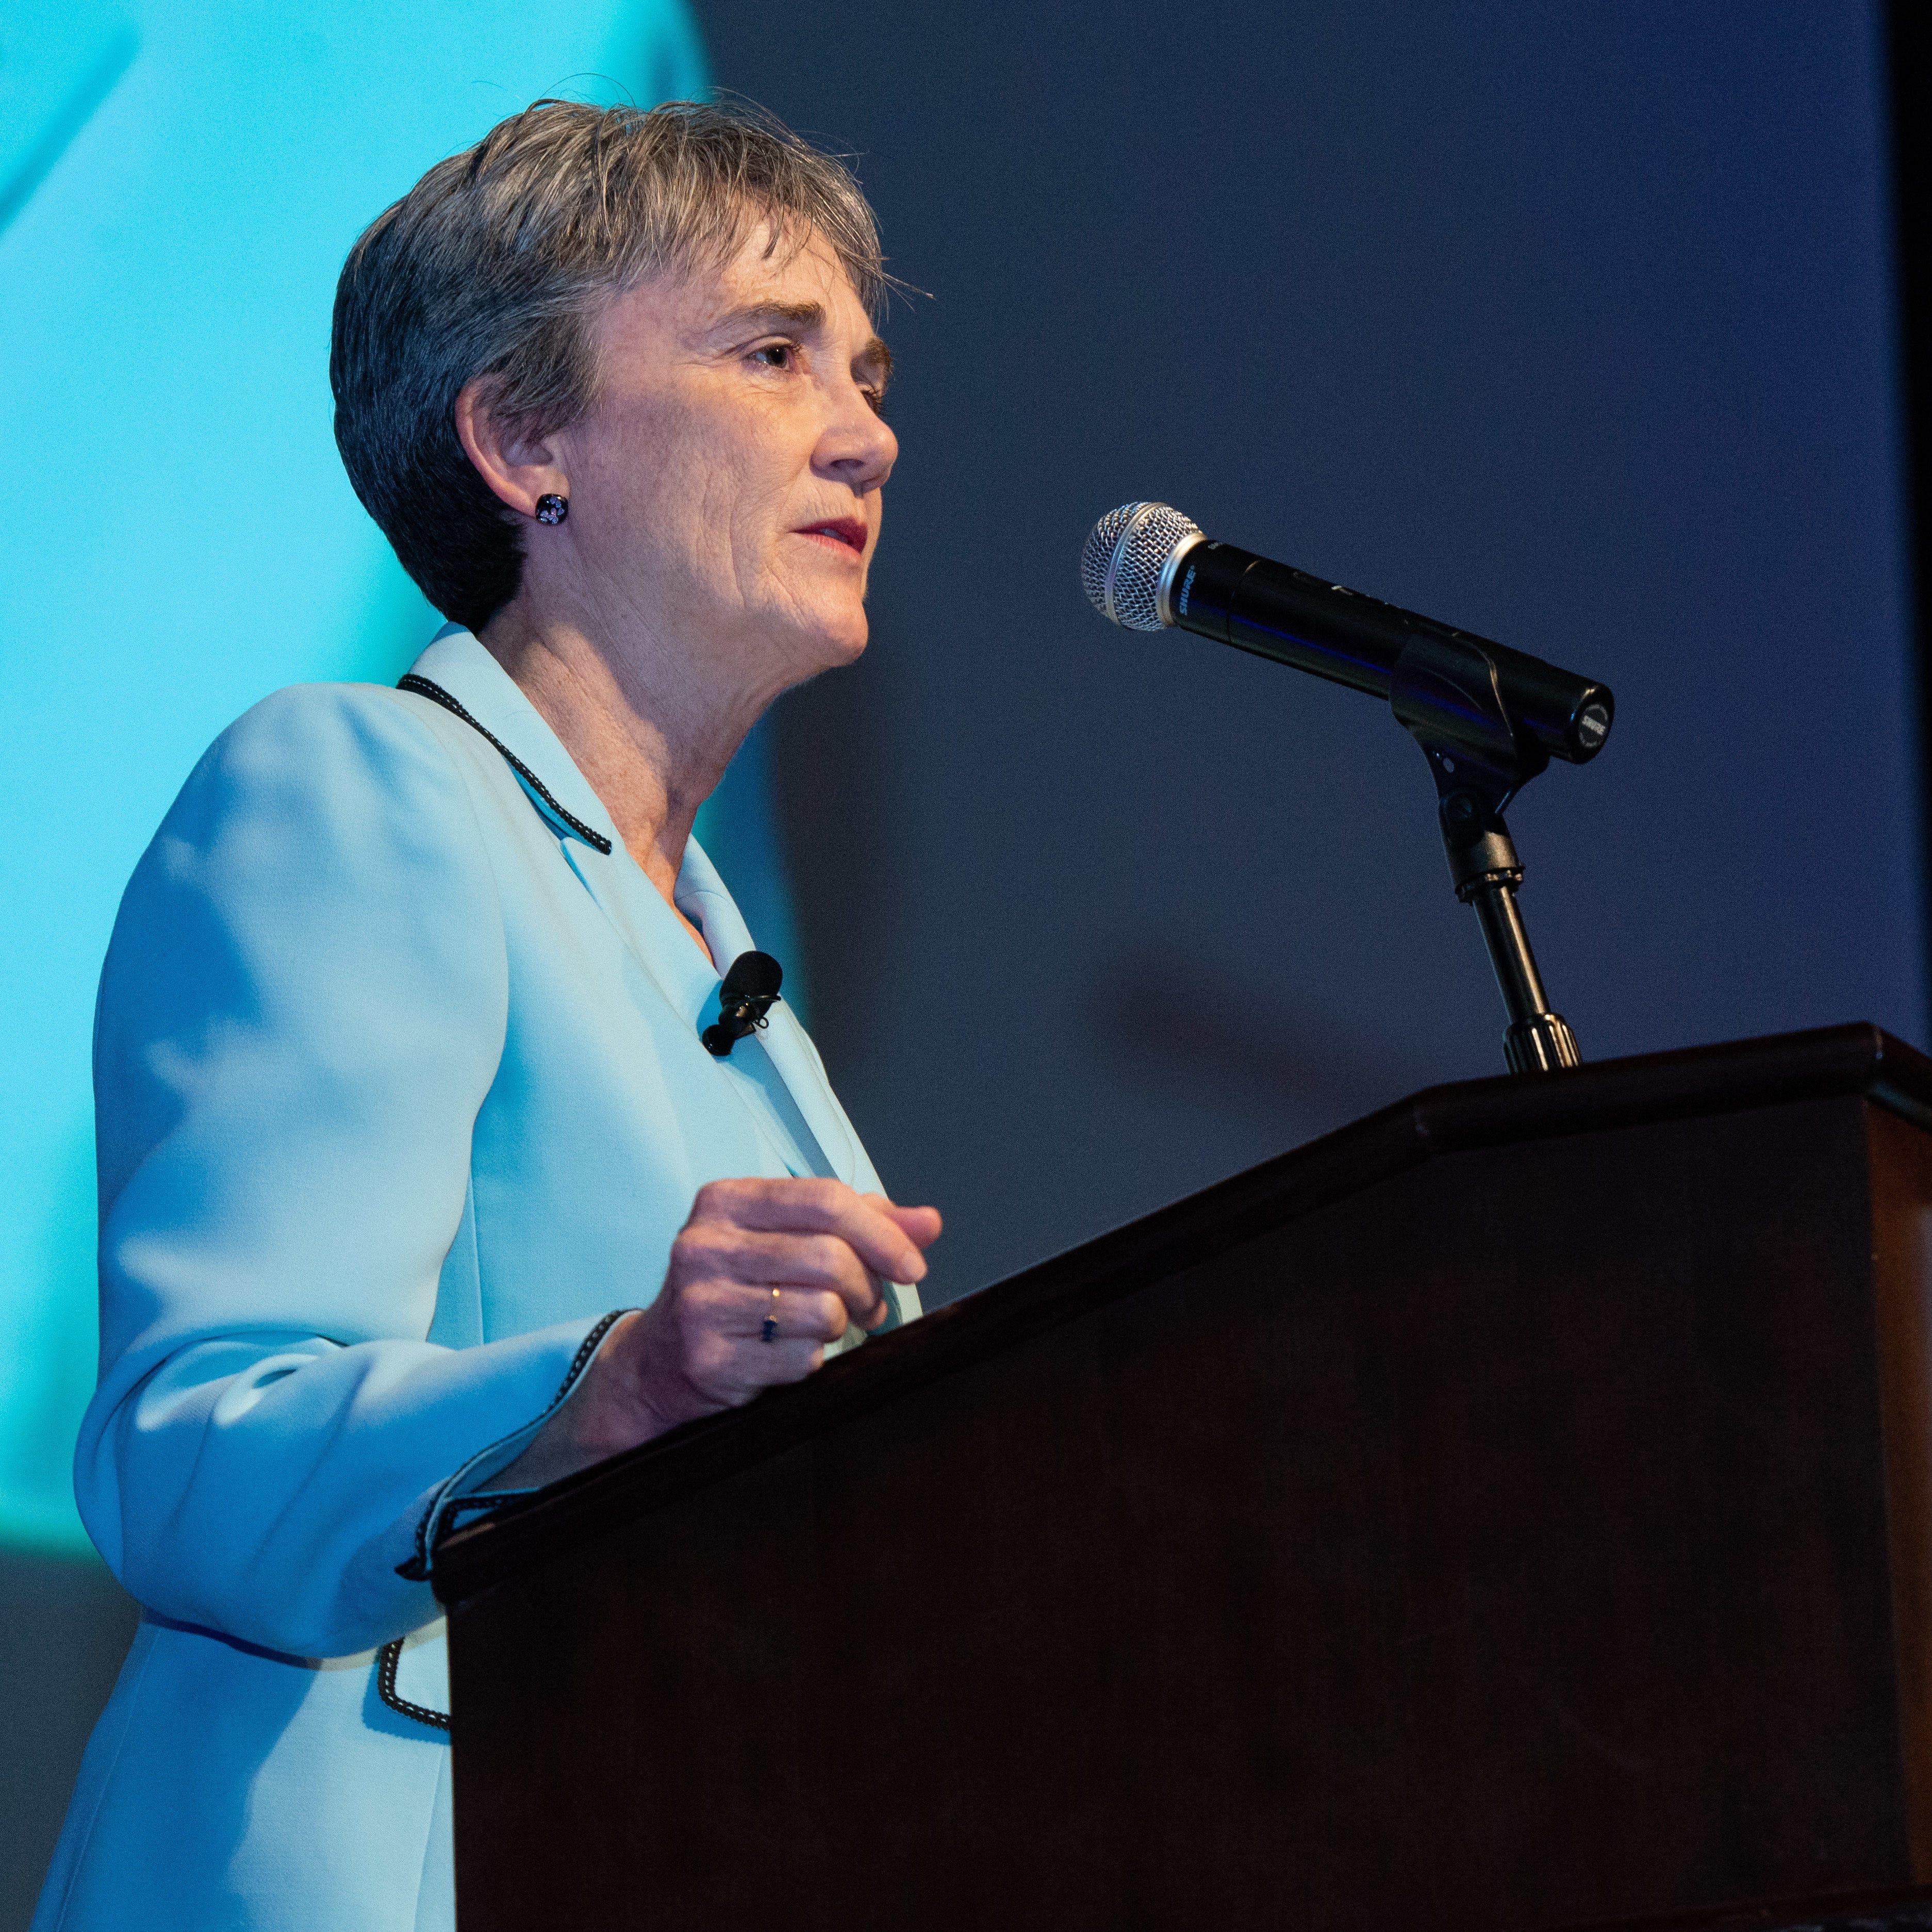 Heather Wilson, U.S. Air Force Secretary, to replace UTEP President Diana Natalicio